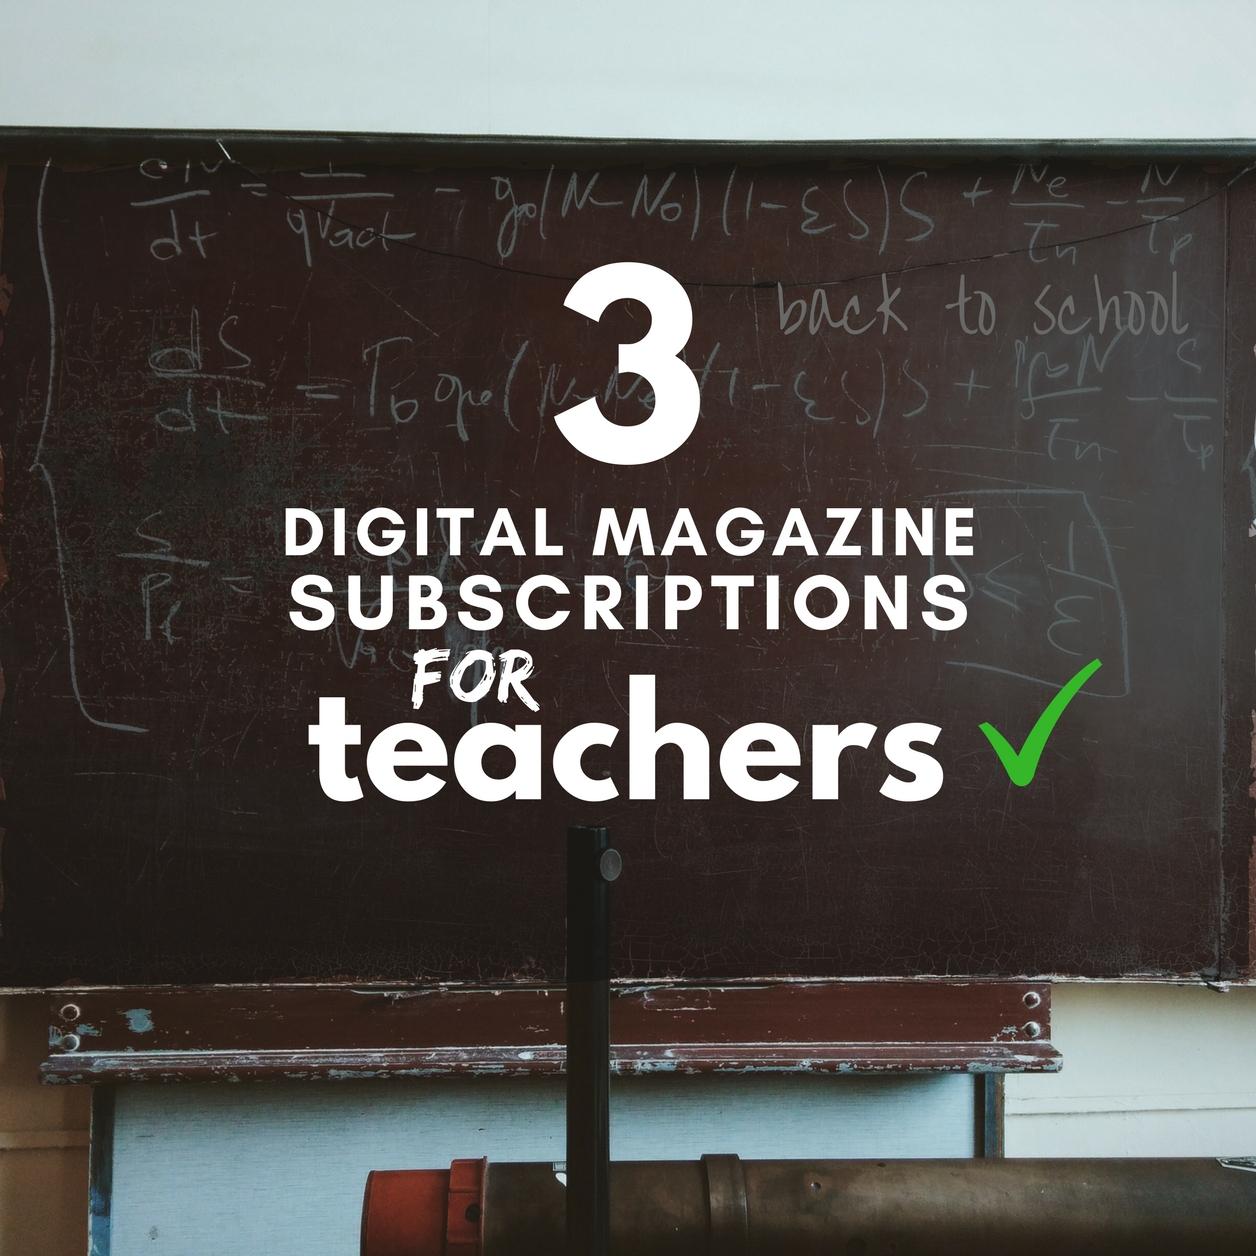 3 Digital Magazine Subscriptions for Teachers